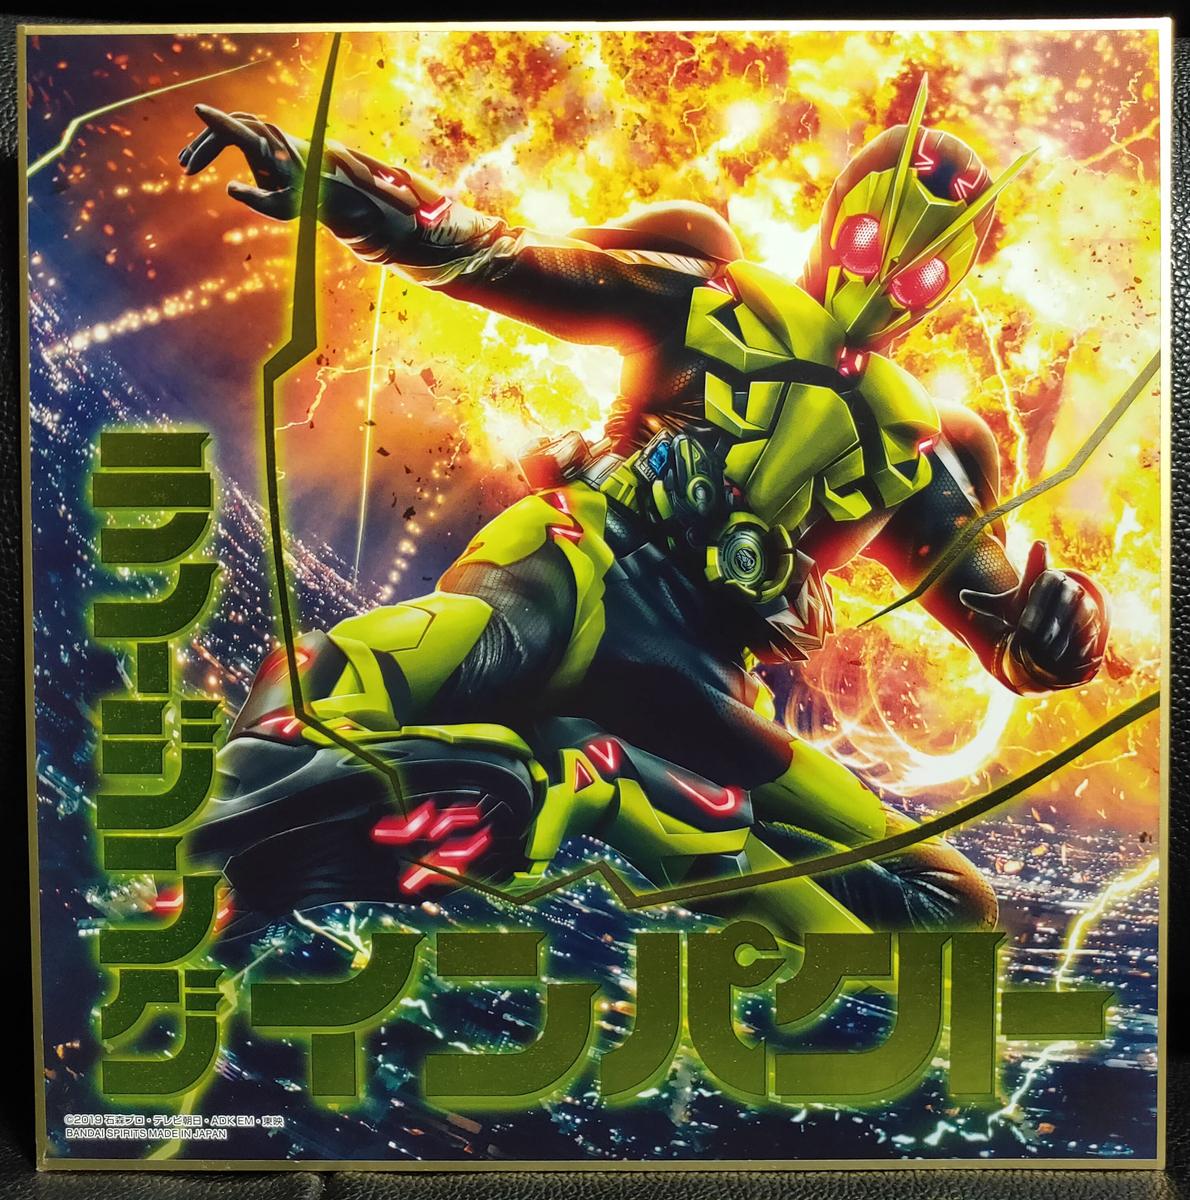 f:id:hiroban-ch:20200802025002j:plain